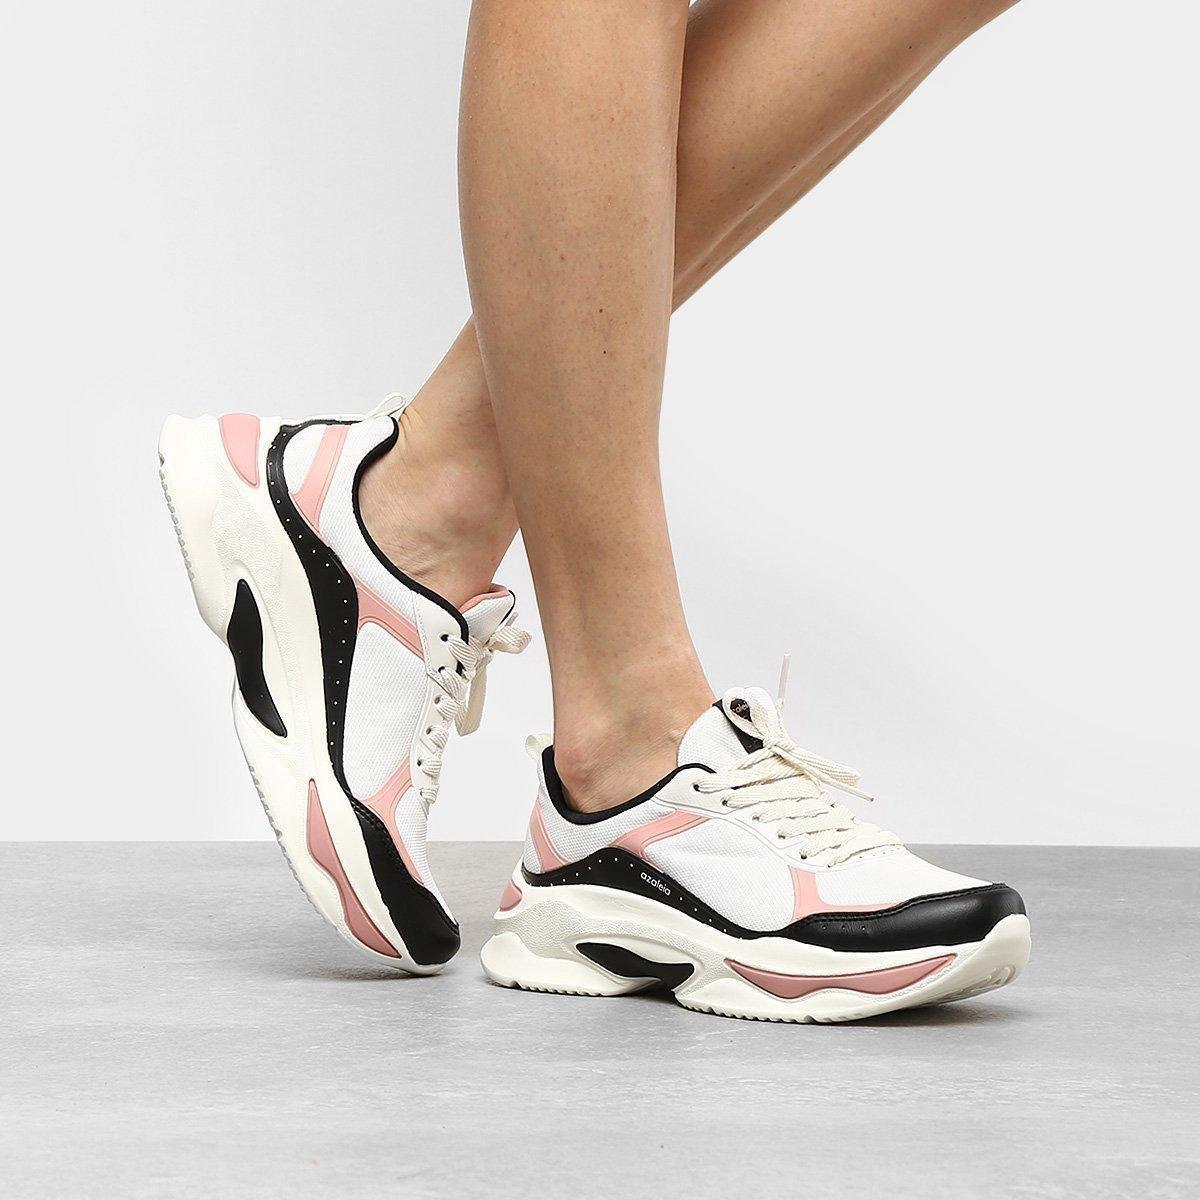 0db5b7dd332 Tênis Azaleia Chunky Sneaker Feminino - Compre Agora